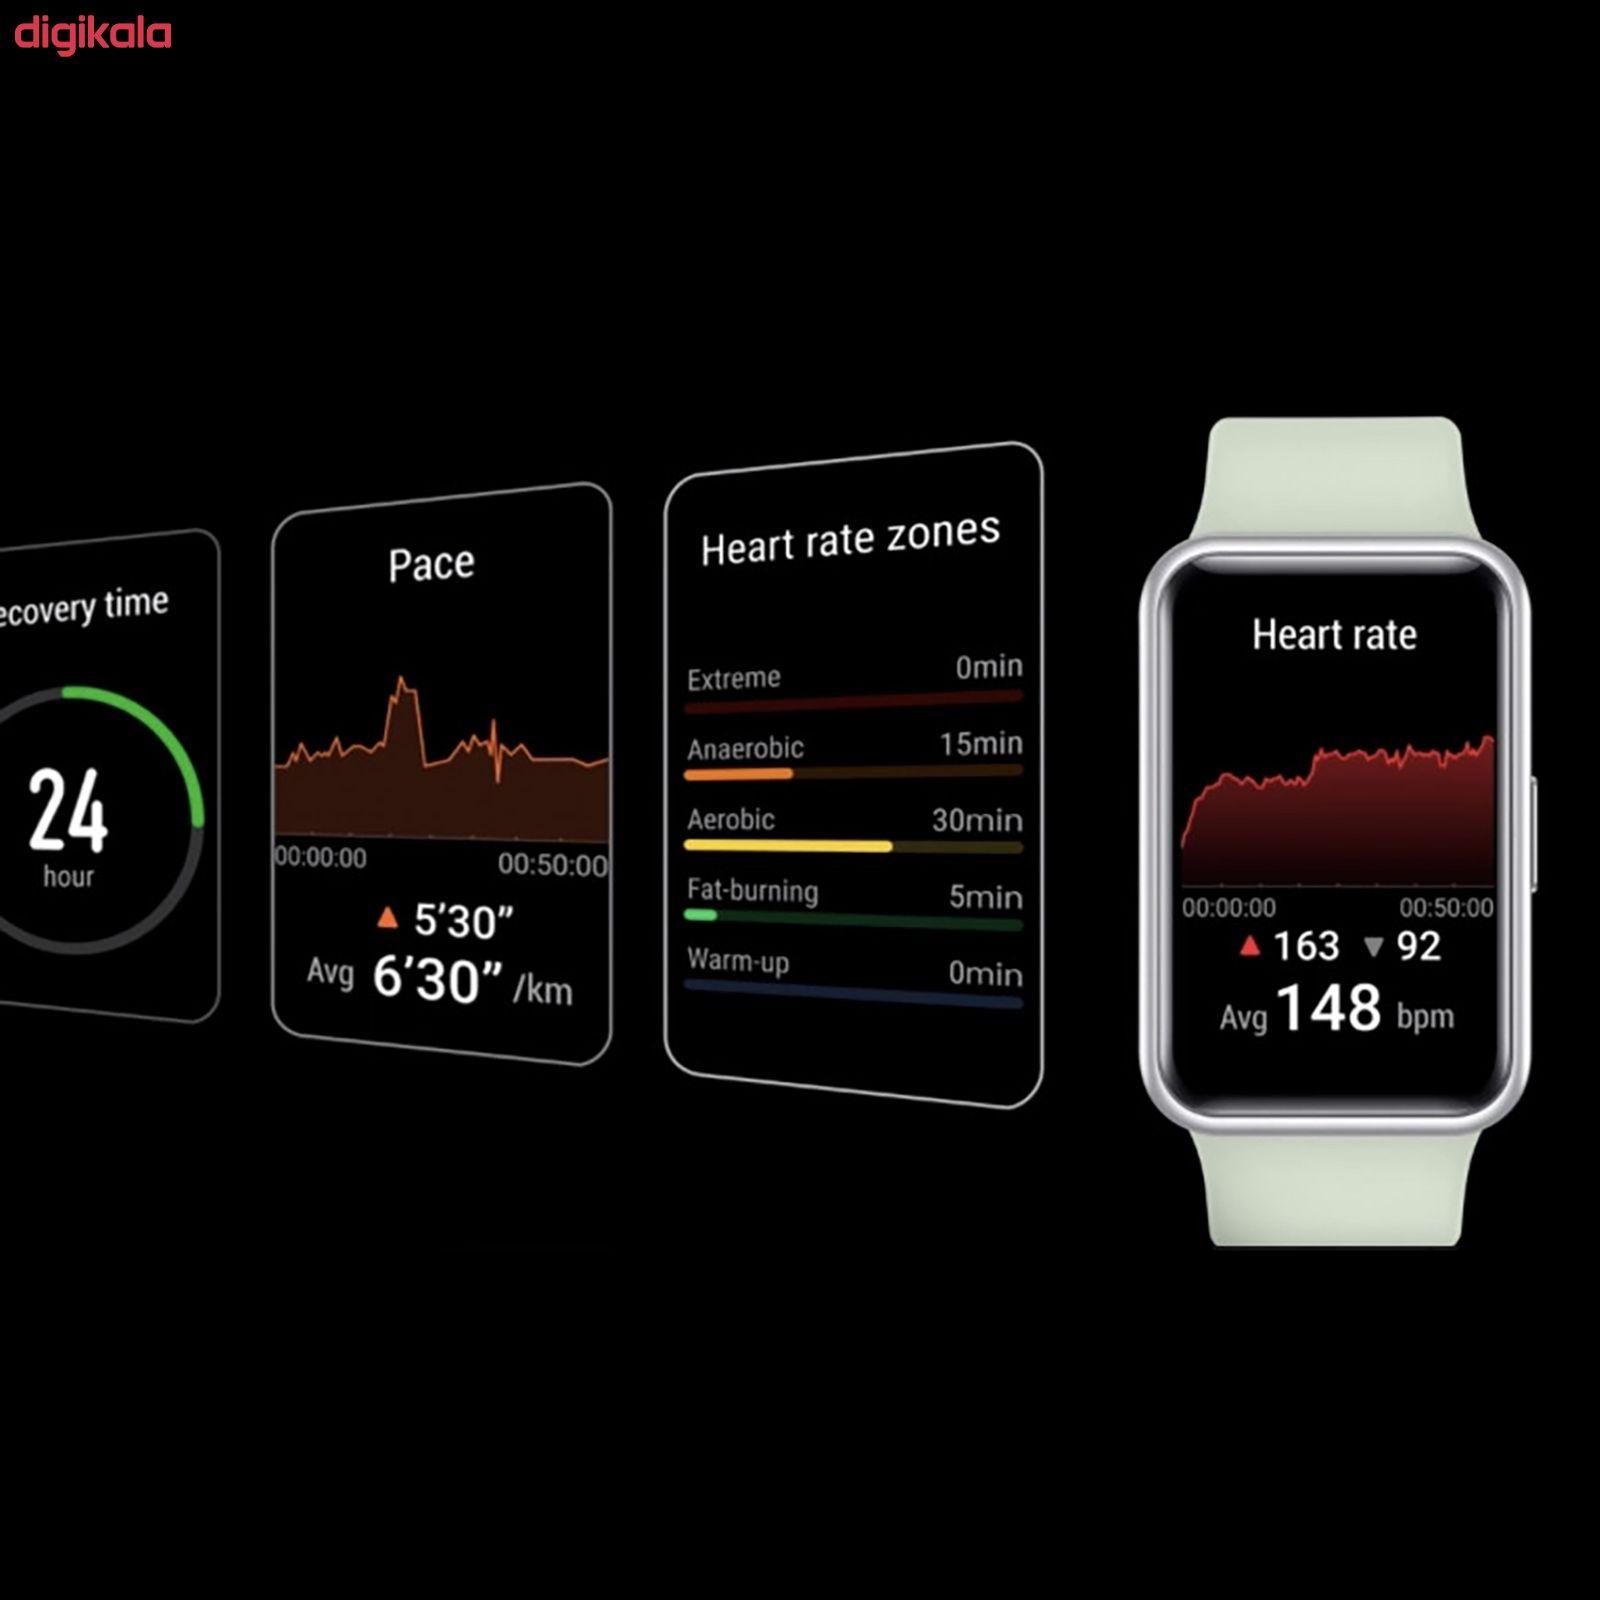 ساعت هوشمند هوآوی مدل WATCH FIT main 1 12